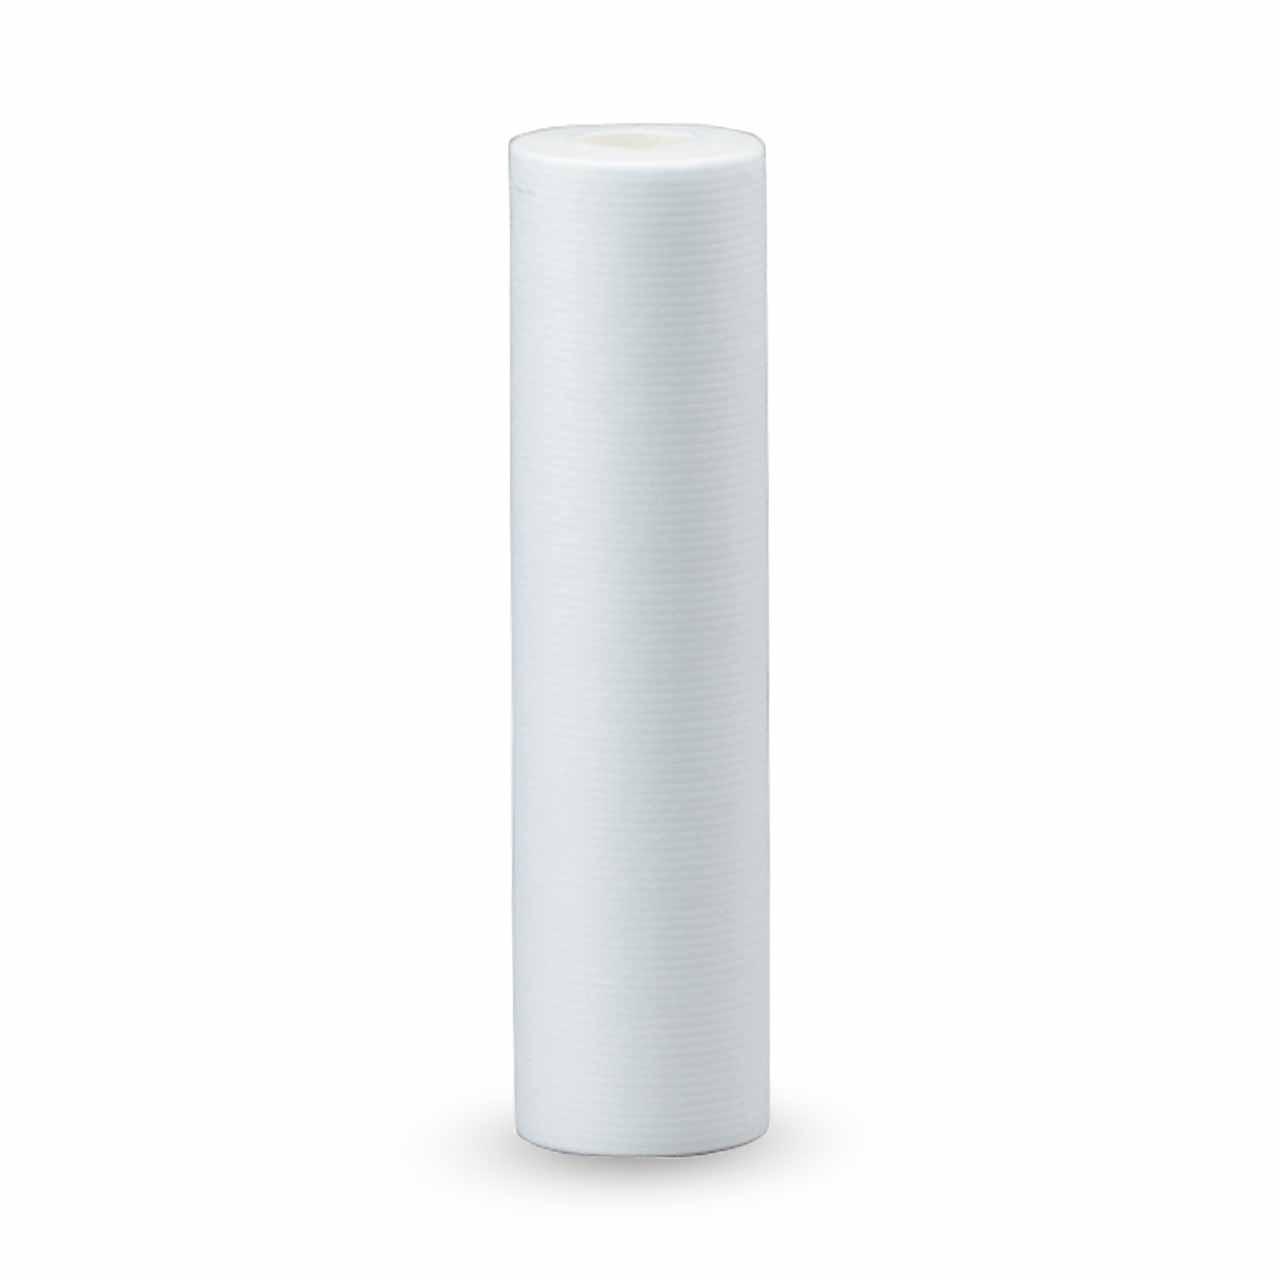 "10/"" 5 Micron Polypropelene Sediment Filter Cartridge"